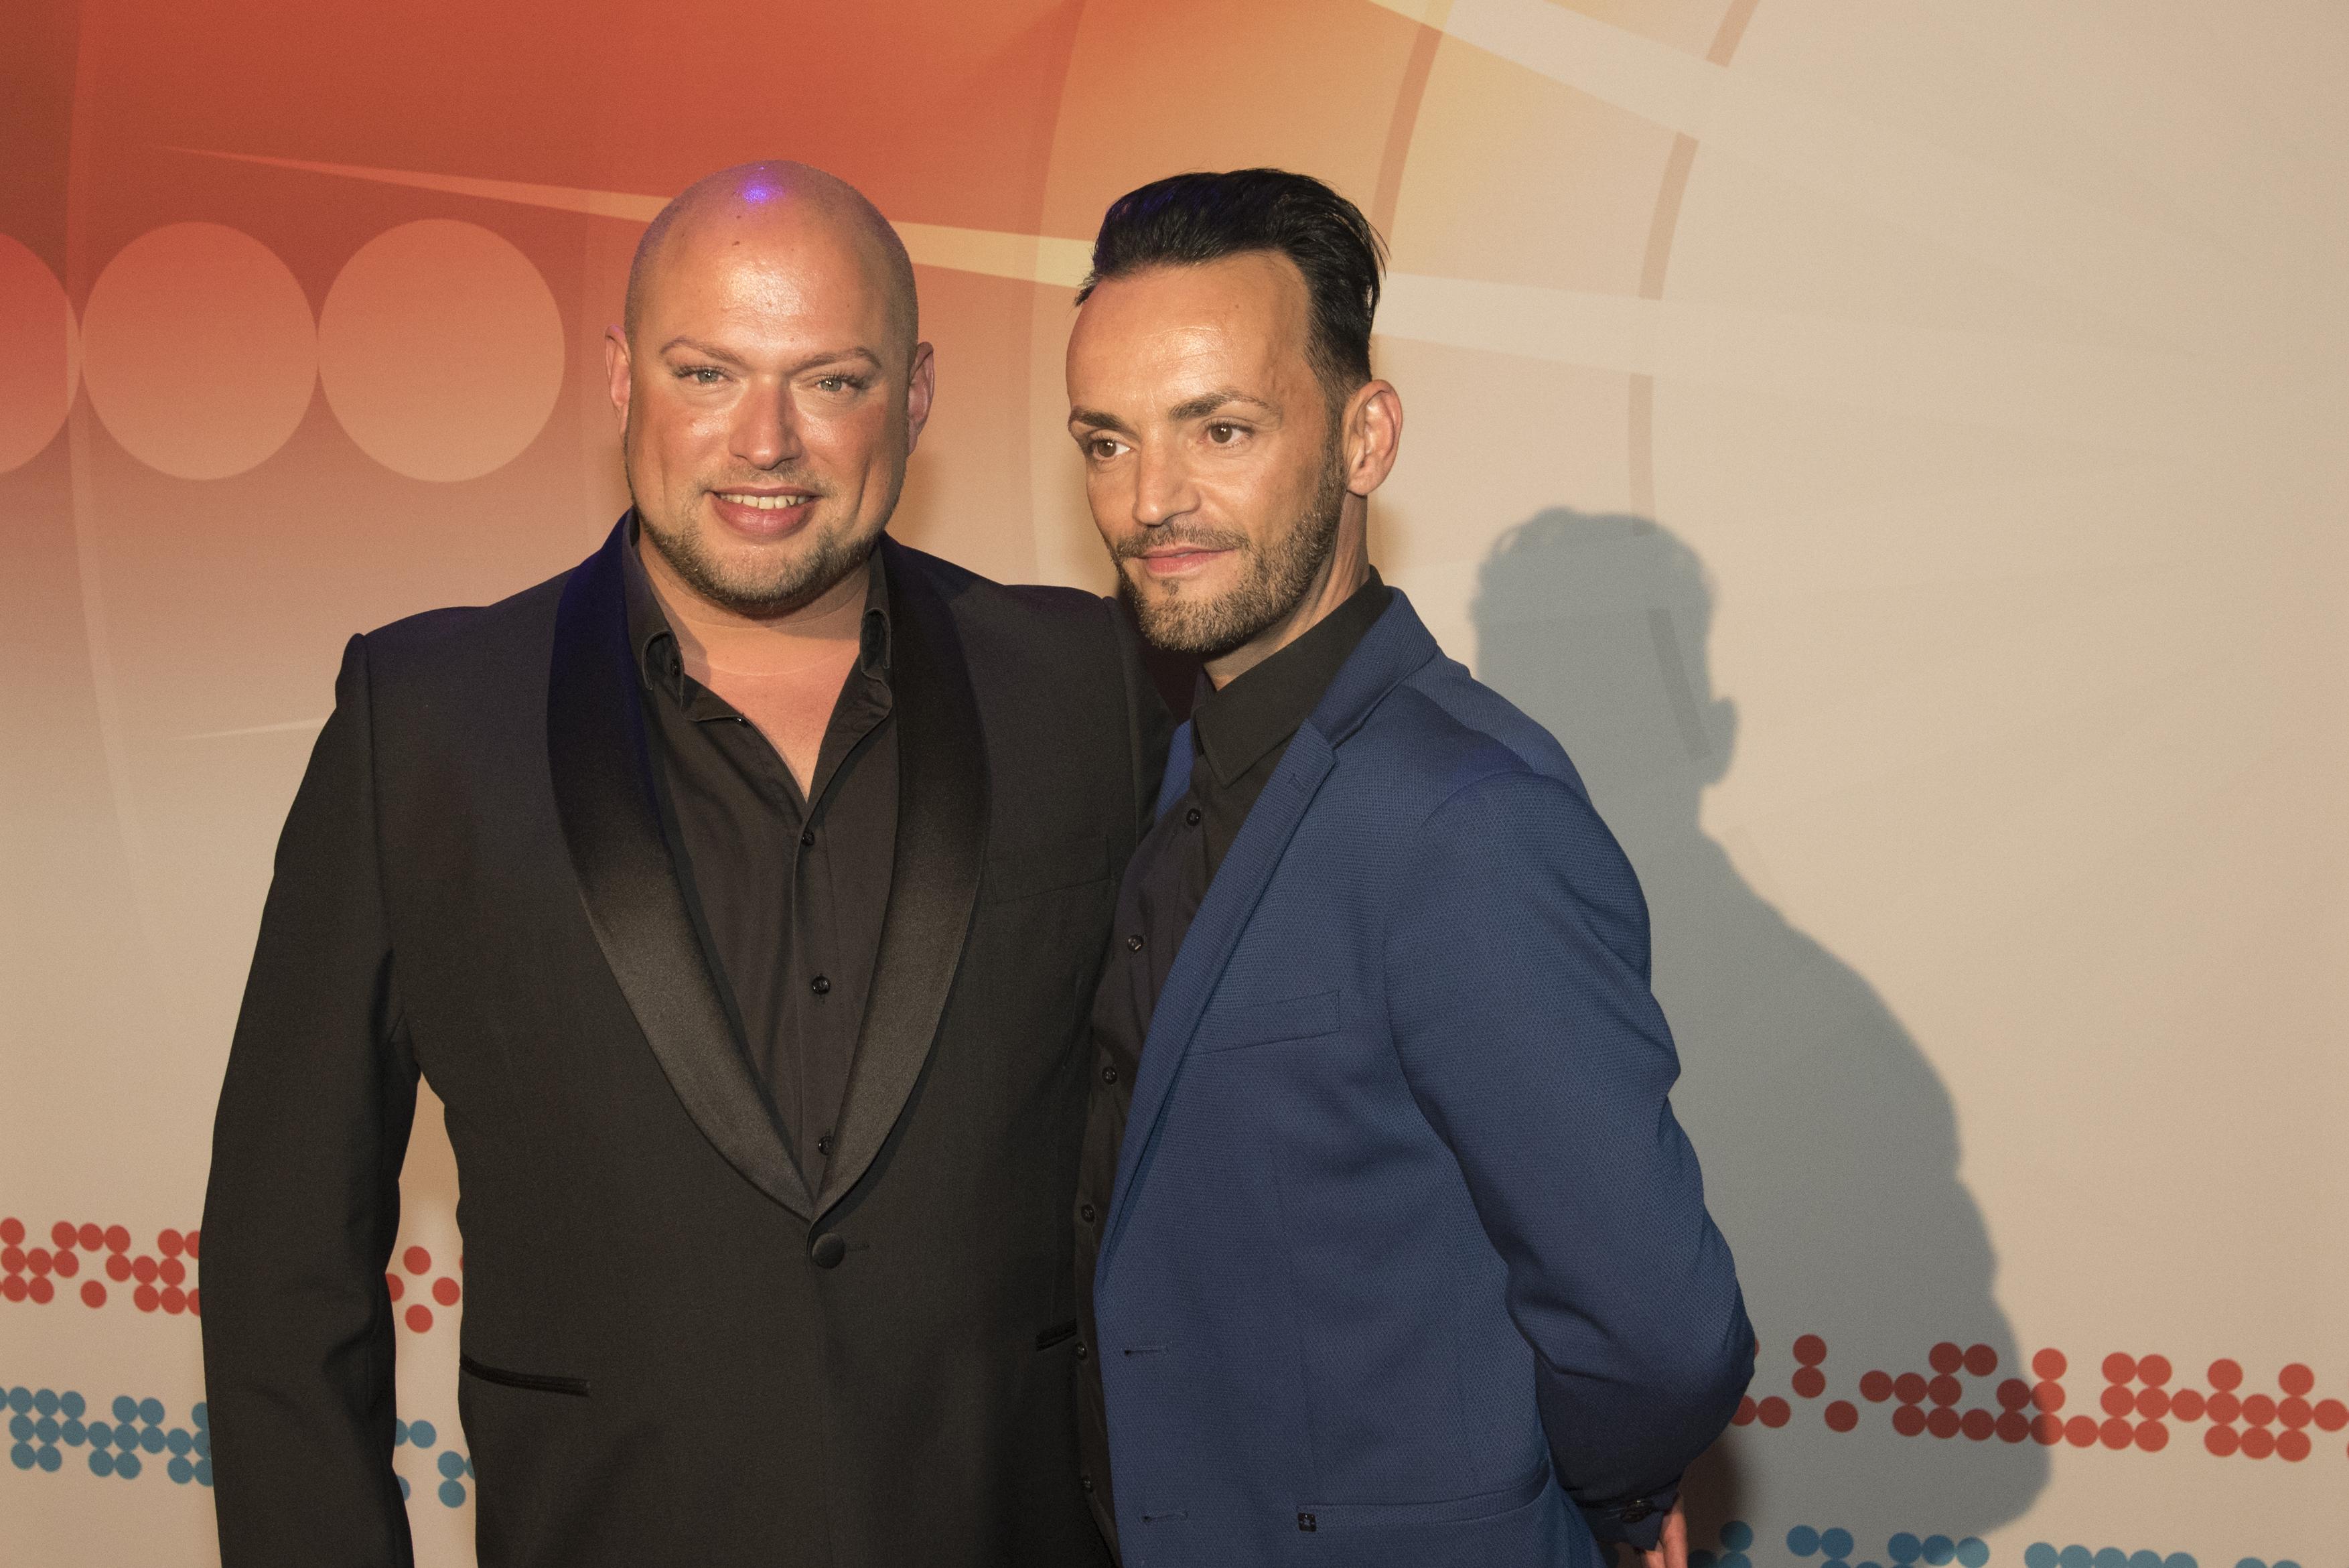 Jeffrey Kuipers en Michael Van Zwol tijdens Buma NL Awards 2017 - Fotocredits: Shali Blok (ArtiestenNieuws)